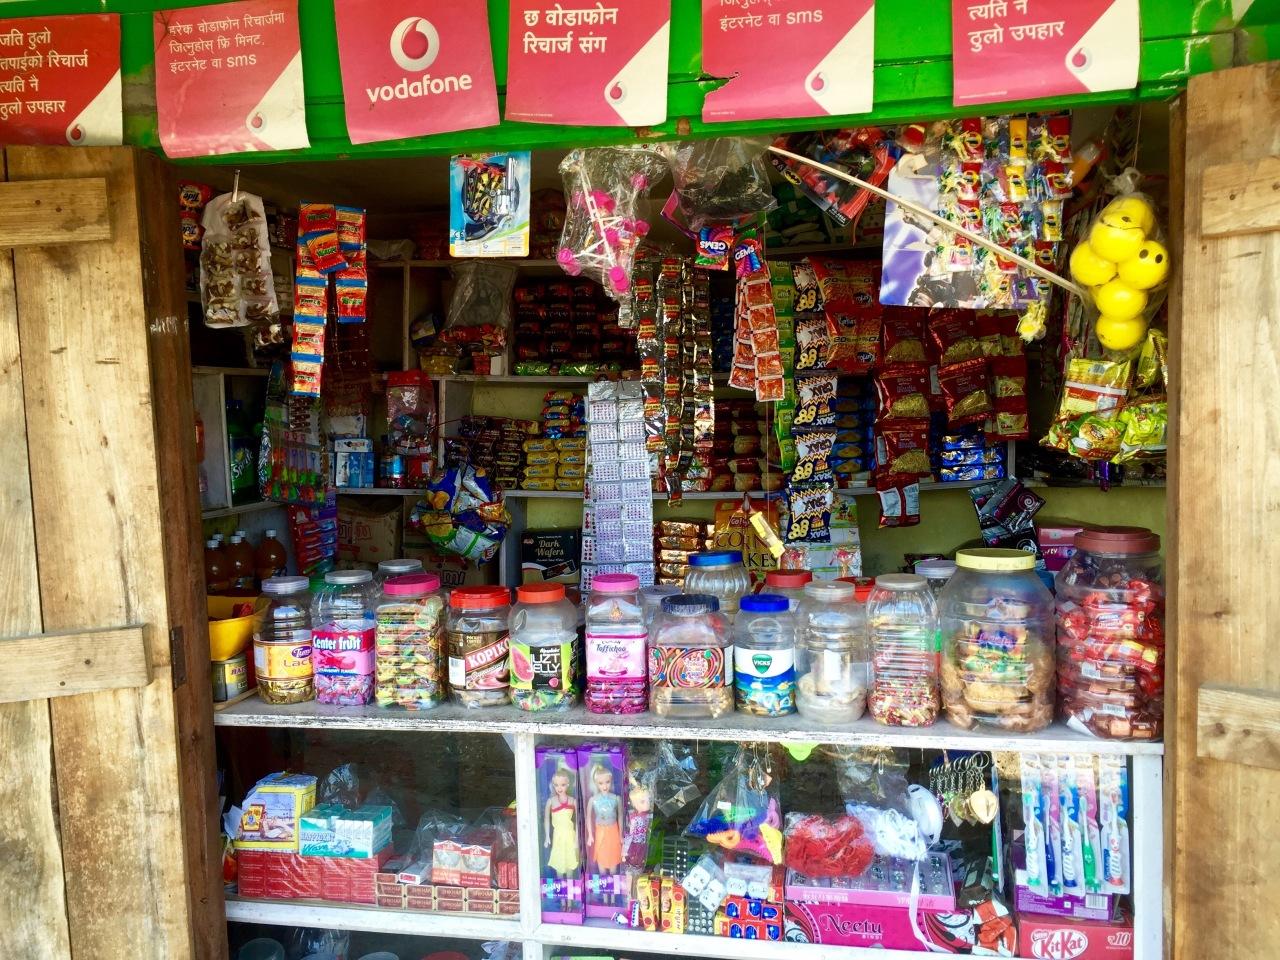 Himalayas #5: Mugshot Bazaar